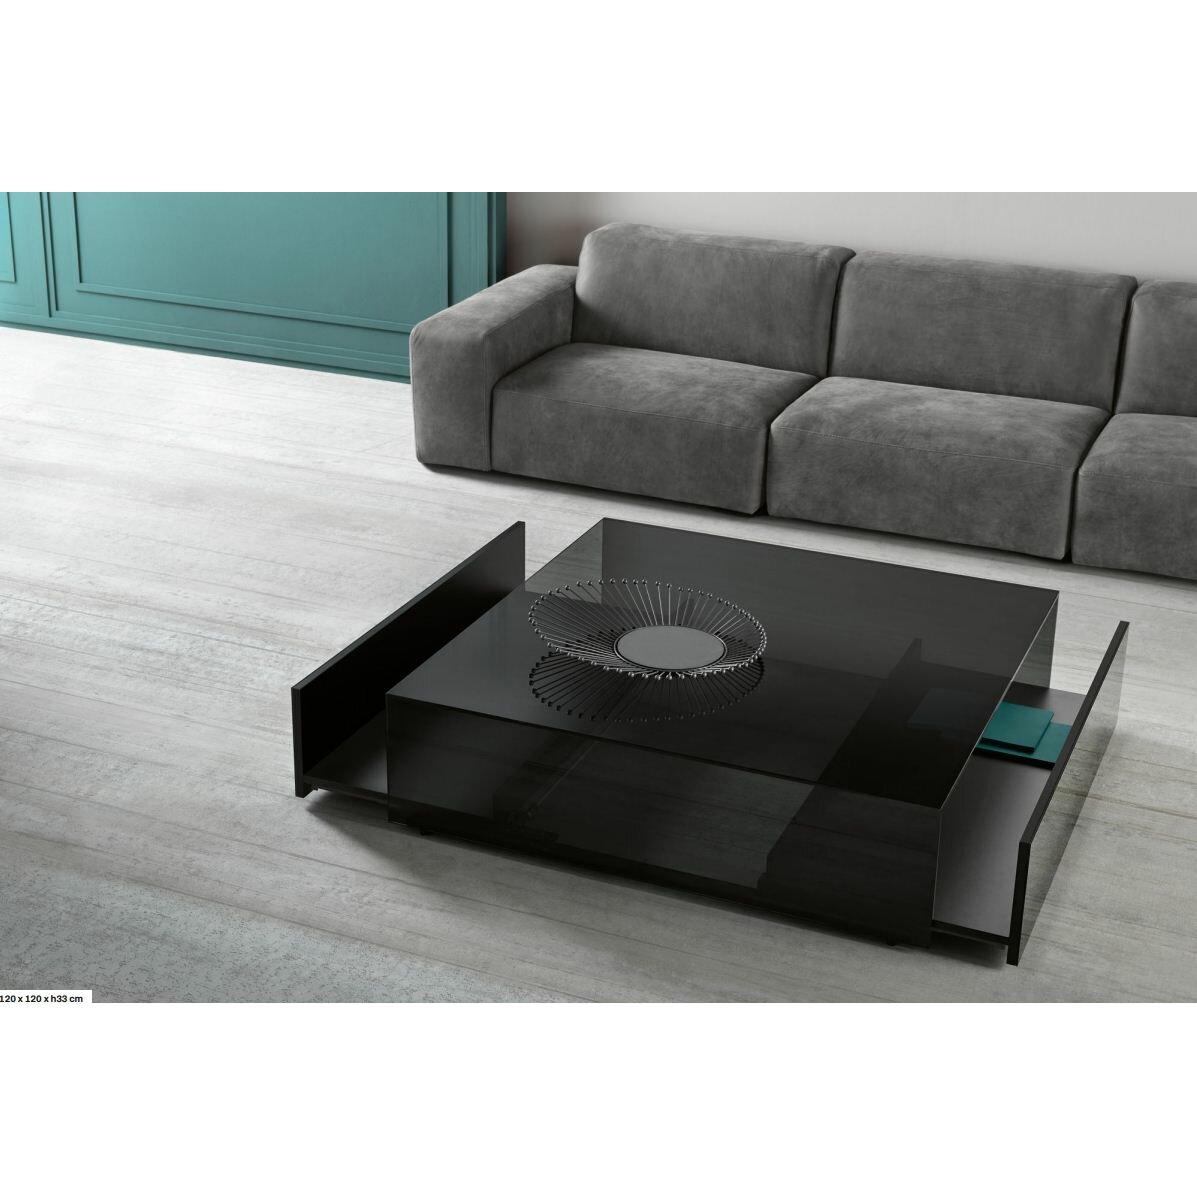 Urban designs cuvillo coffee table wayfair uk for Coffee table urban